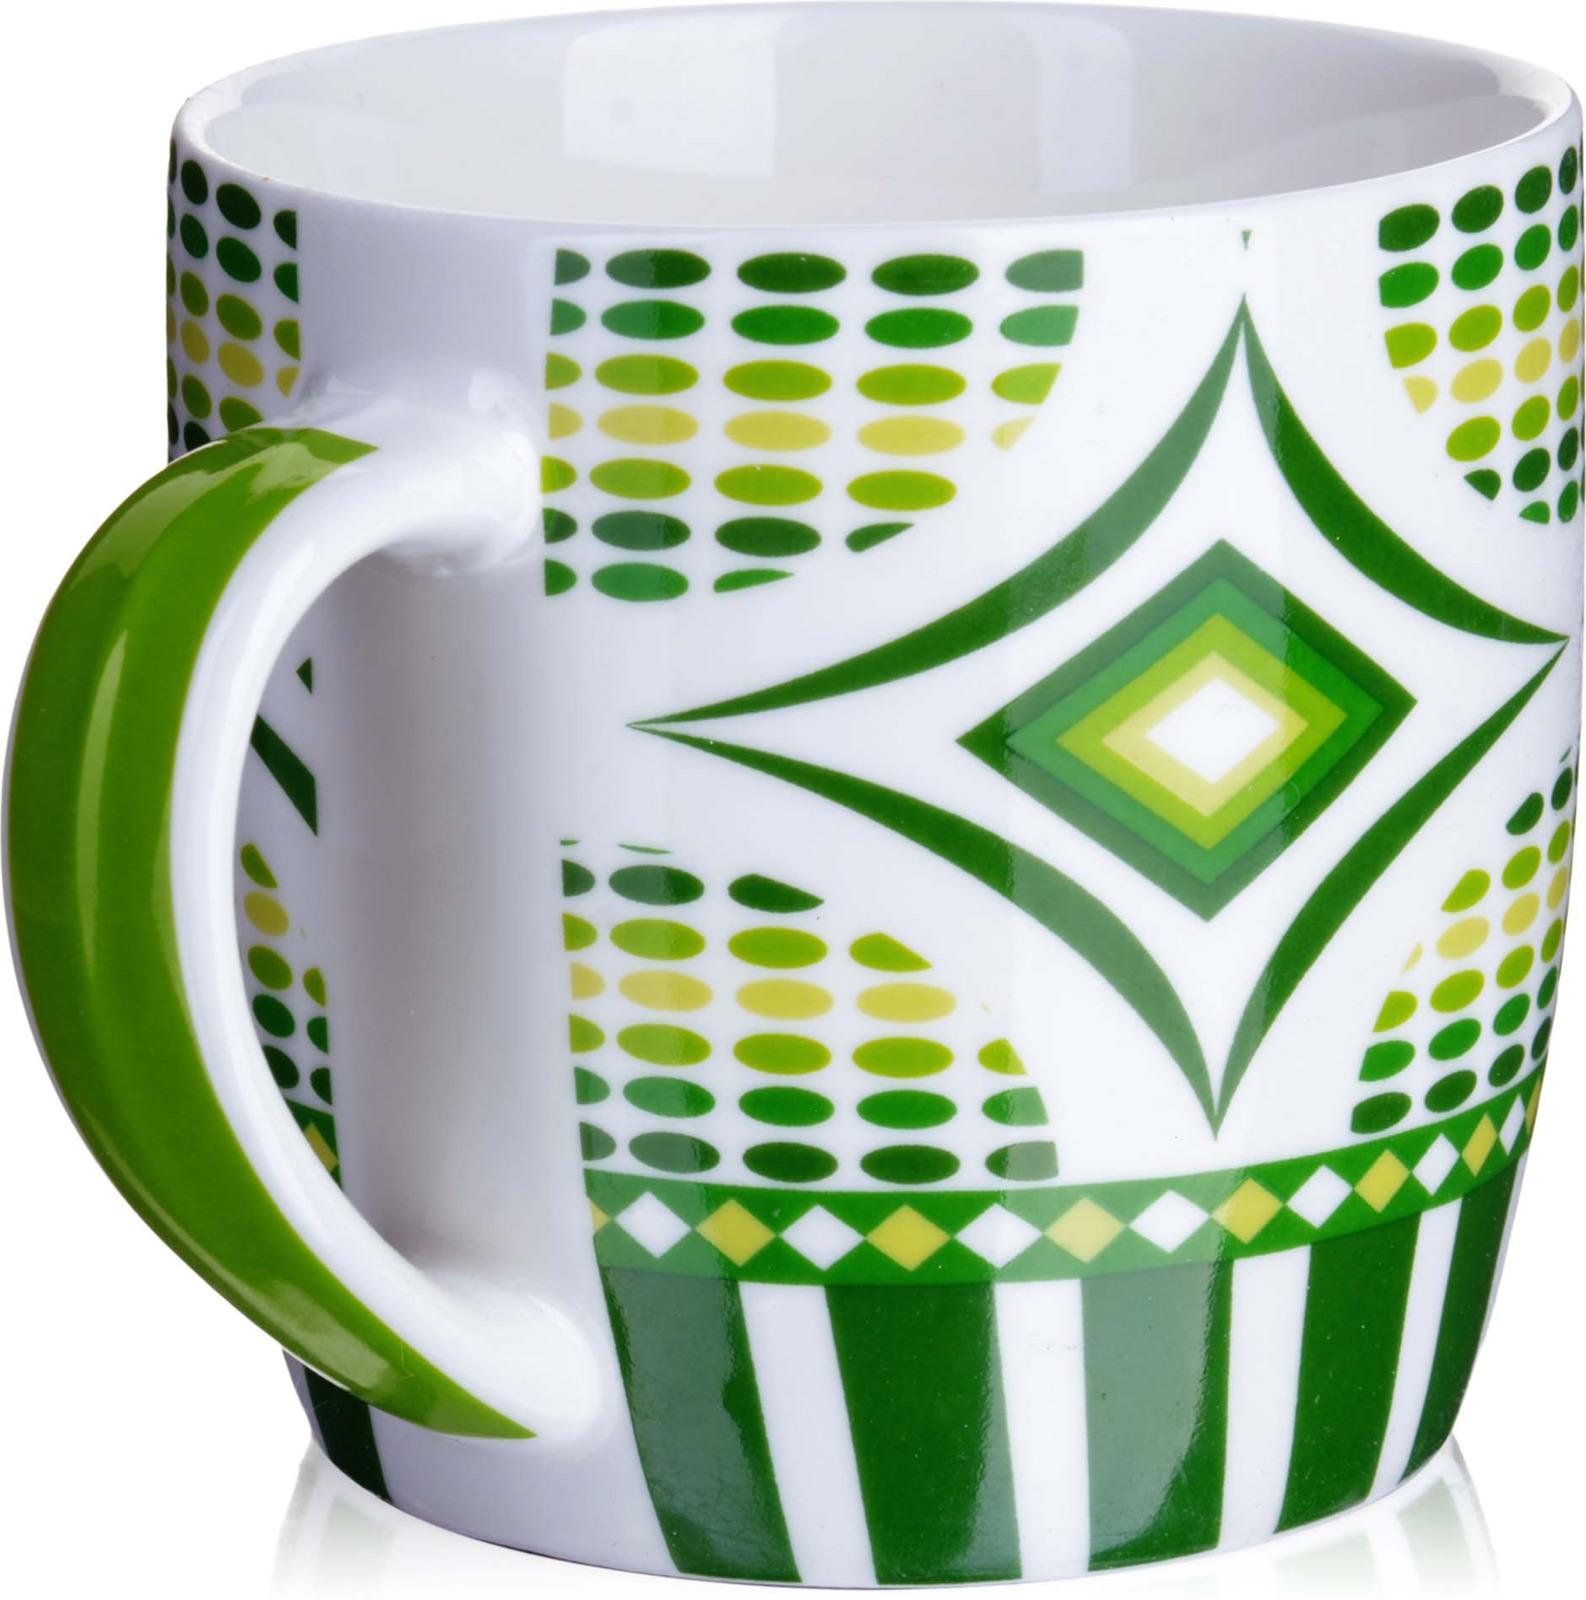 Кружка Loraine, цвет: белый, салатовый, зеленый, 320 мл кружка asa selection coppa цвет салатовый белый 410 мл 19100 801